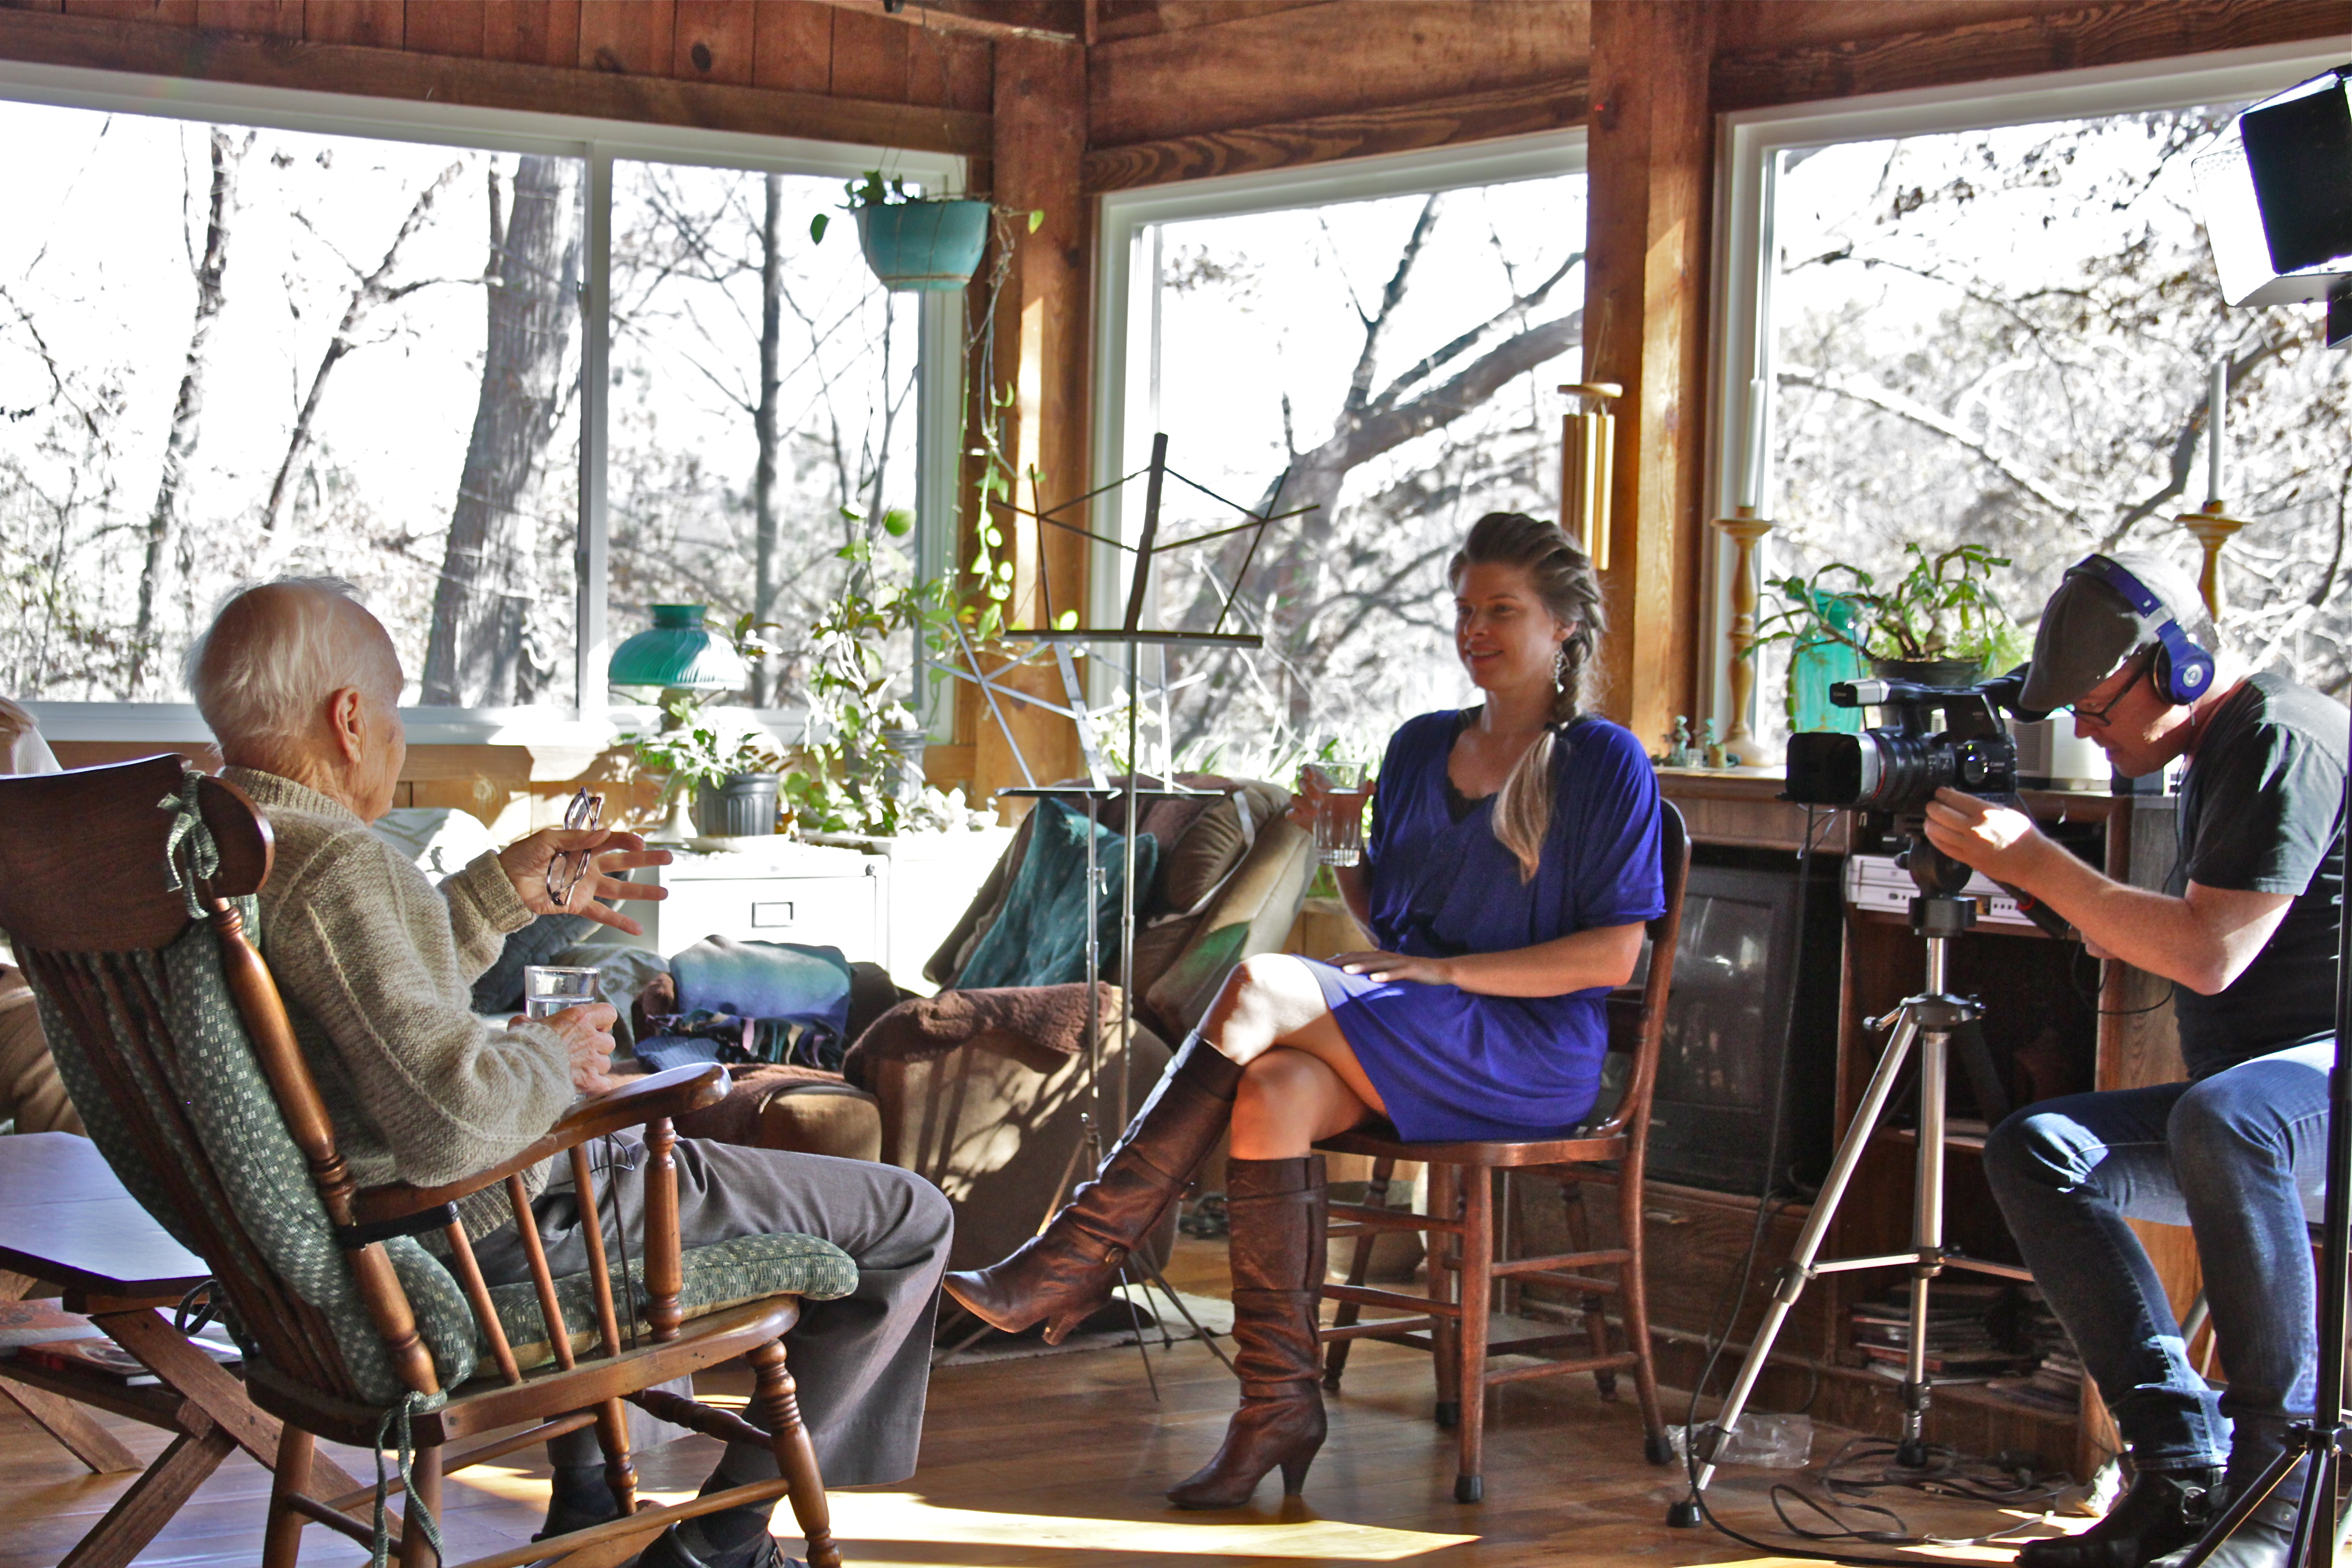 Dr. Rhea Zimmerman & Gregg Marks on set with Joseph Chilton Pearce